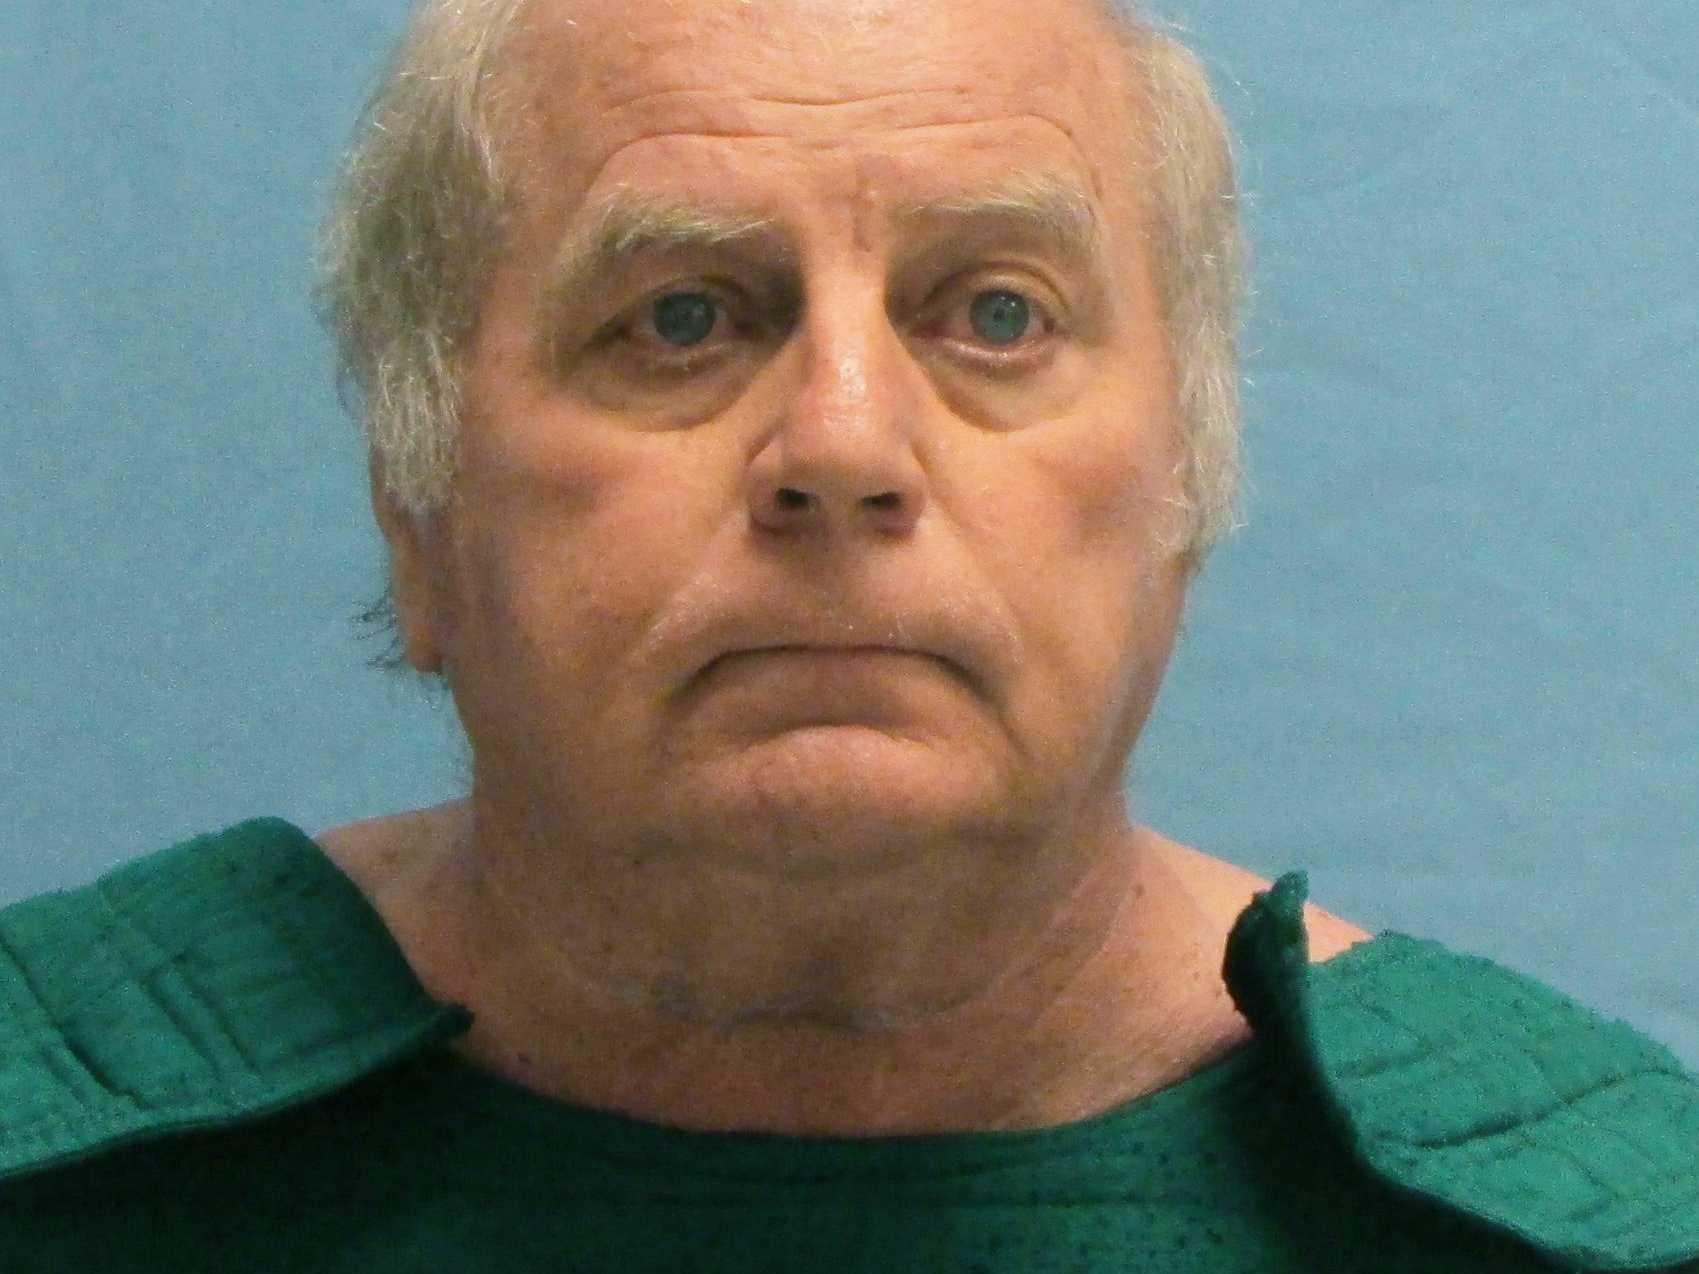 Ex-Judge Admits to Giving Light Sentences for Nude Photos